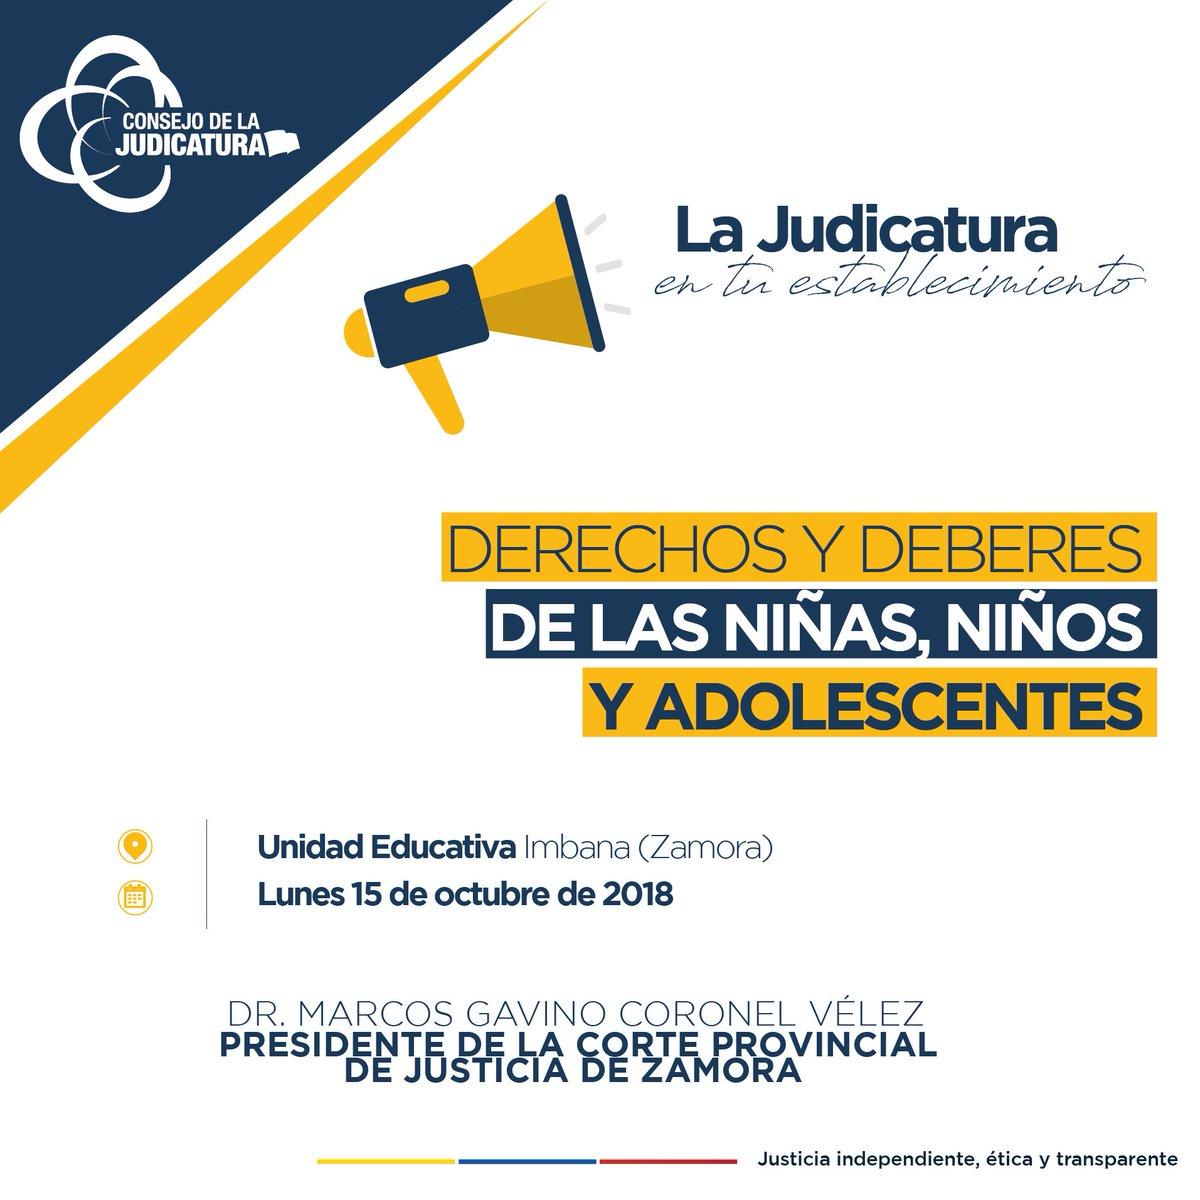 Consejo Judicatura (@CJudicaturaEc) | Twitter